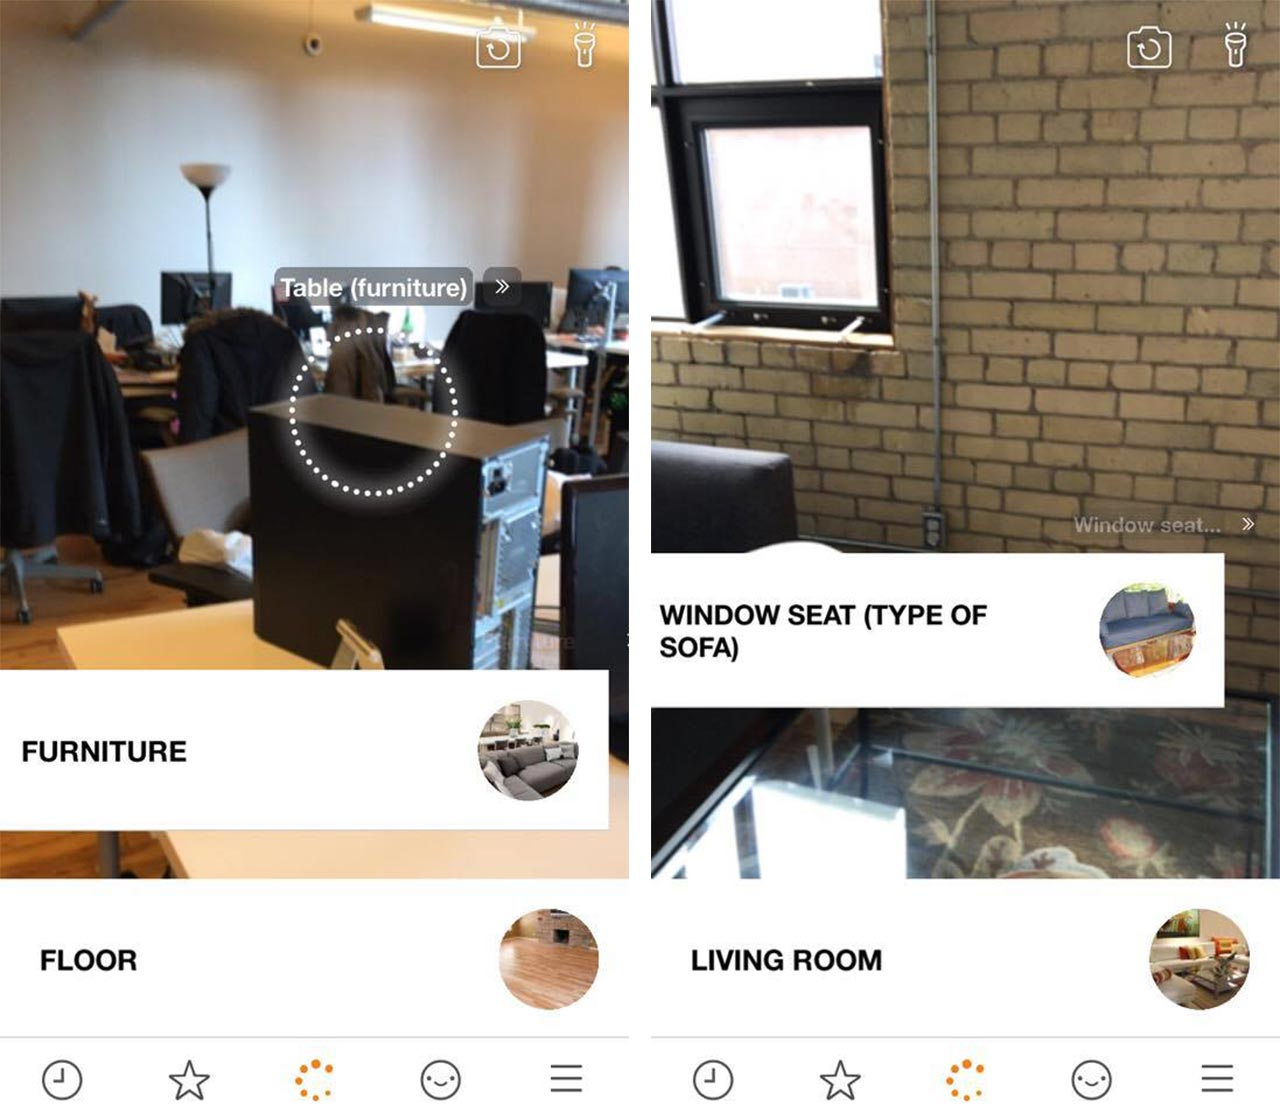 BlippAR App object identification screenshot